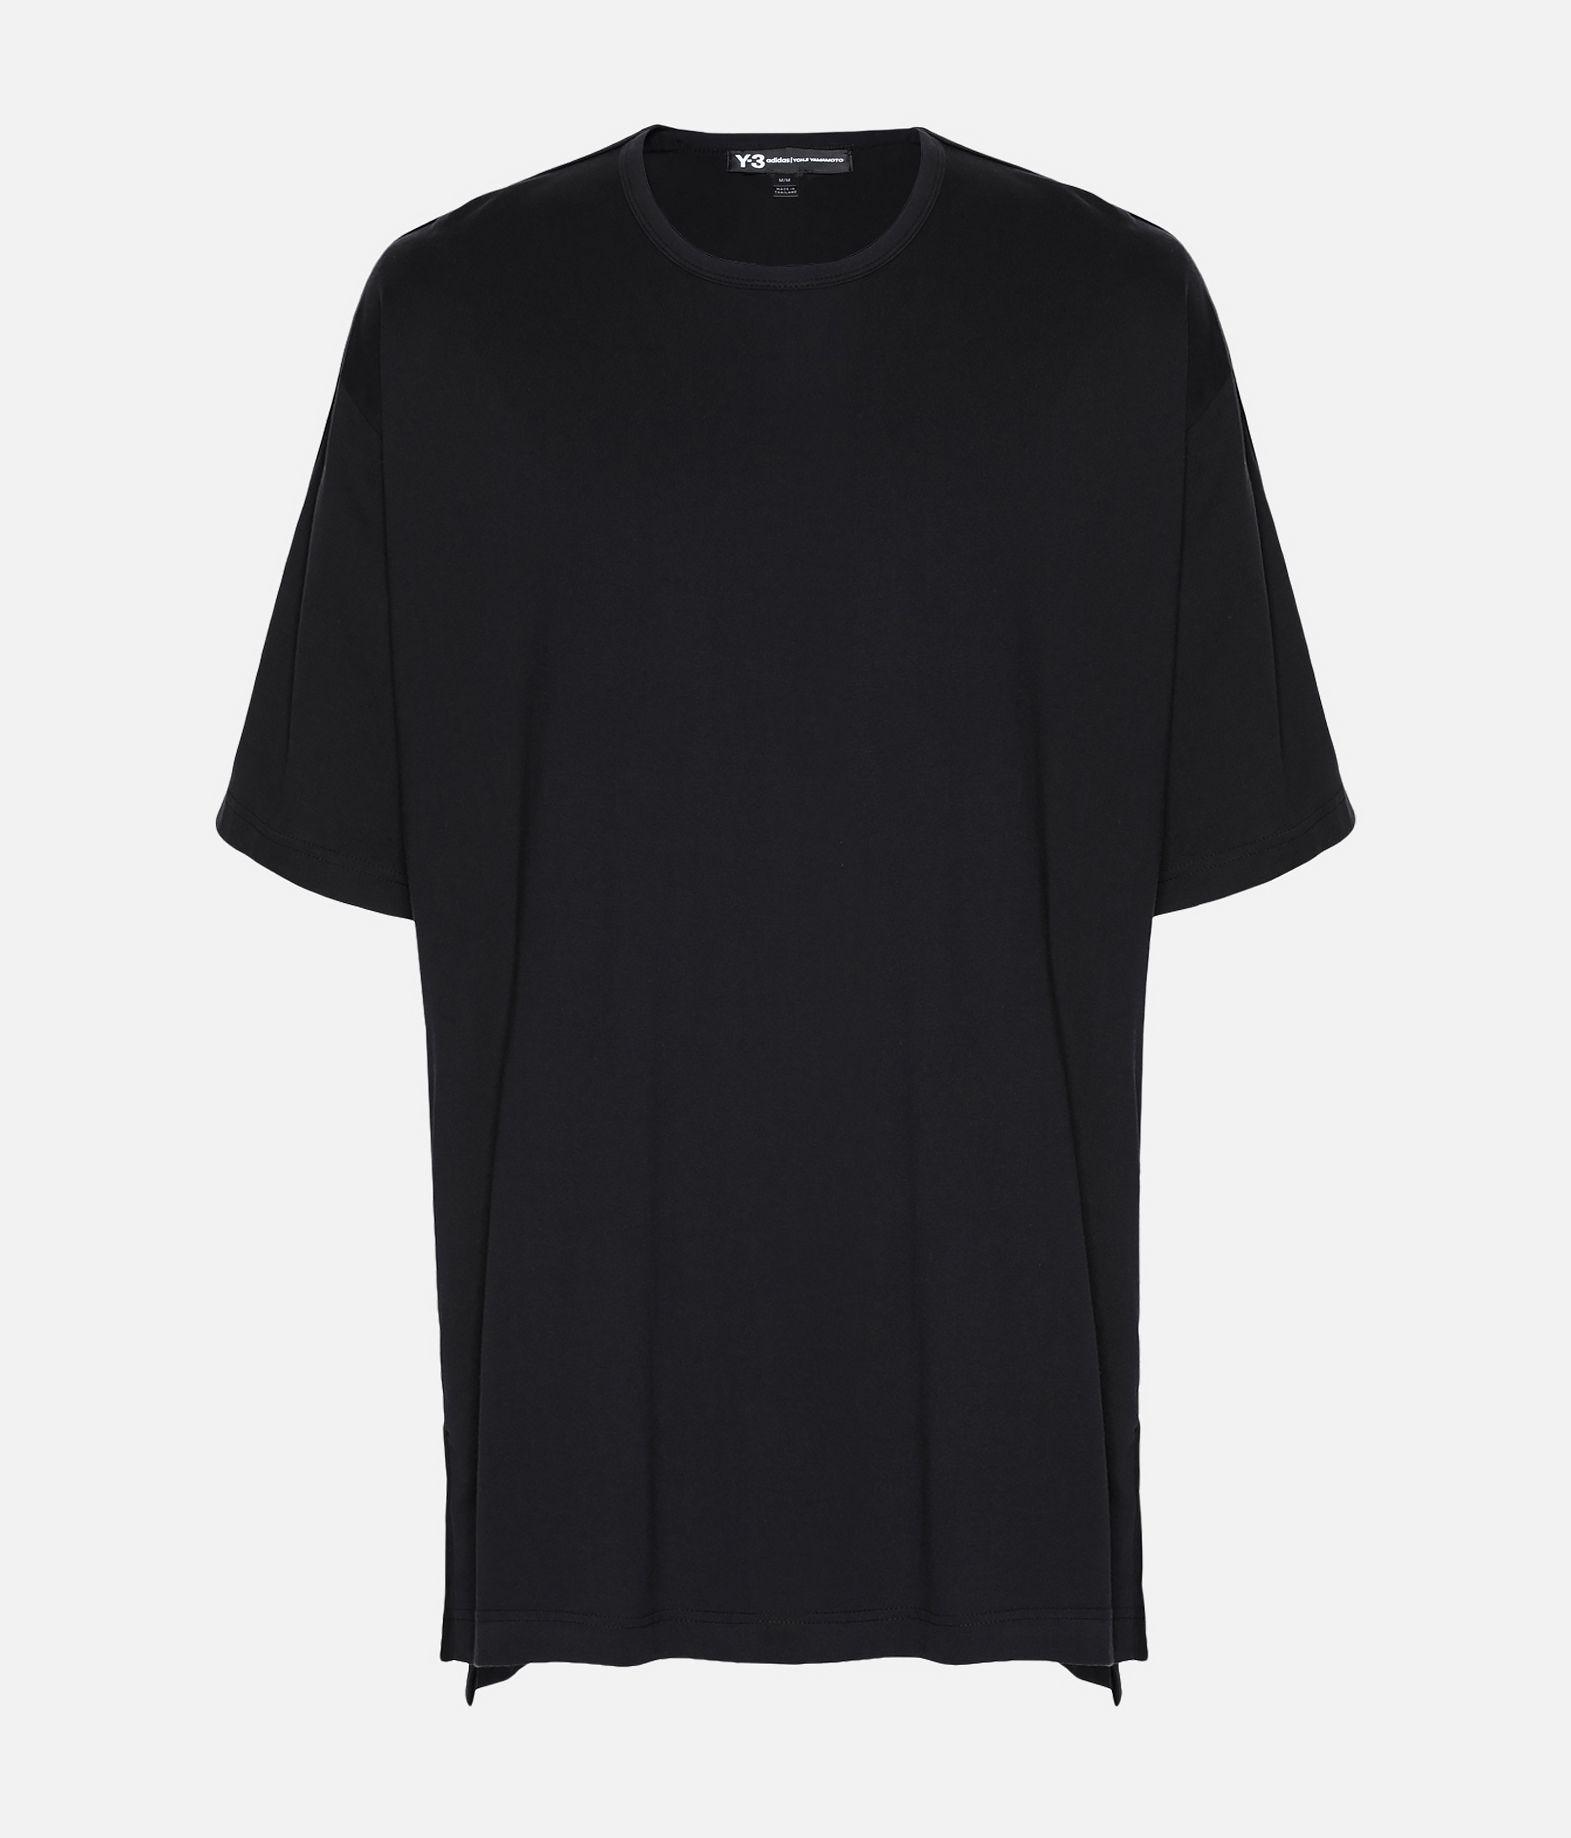 Y-3 Y-3 Parachute Tee Short sleeve t-shirt Man f